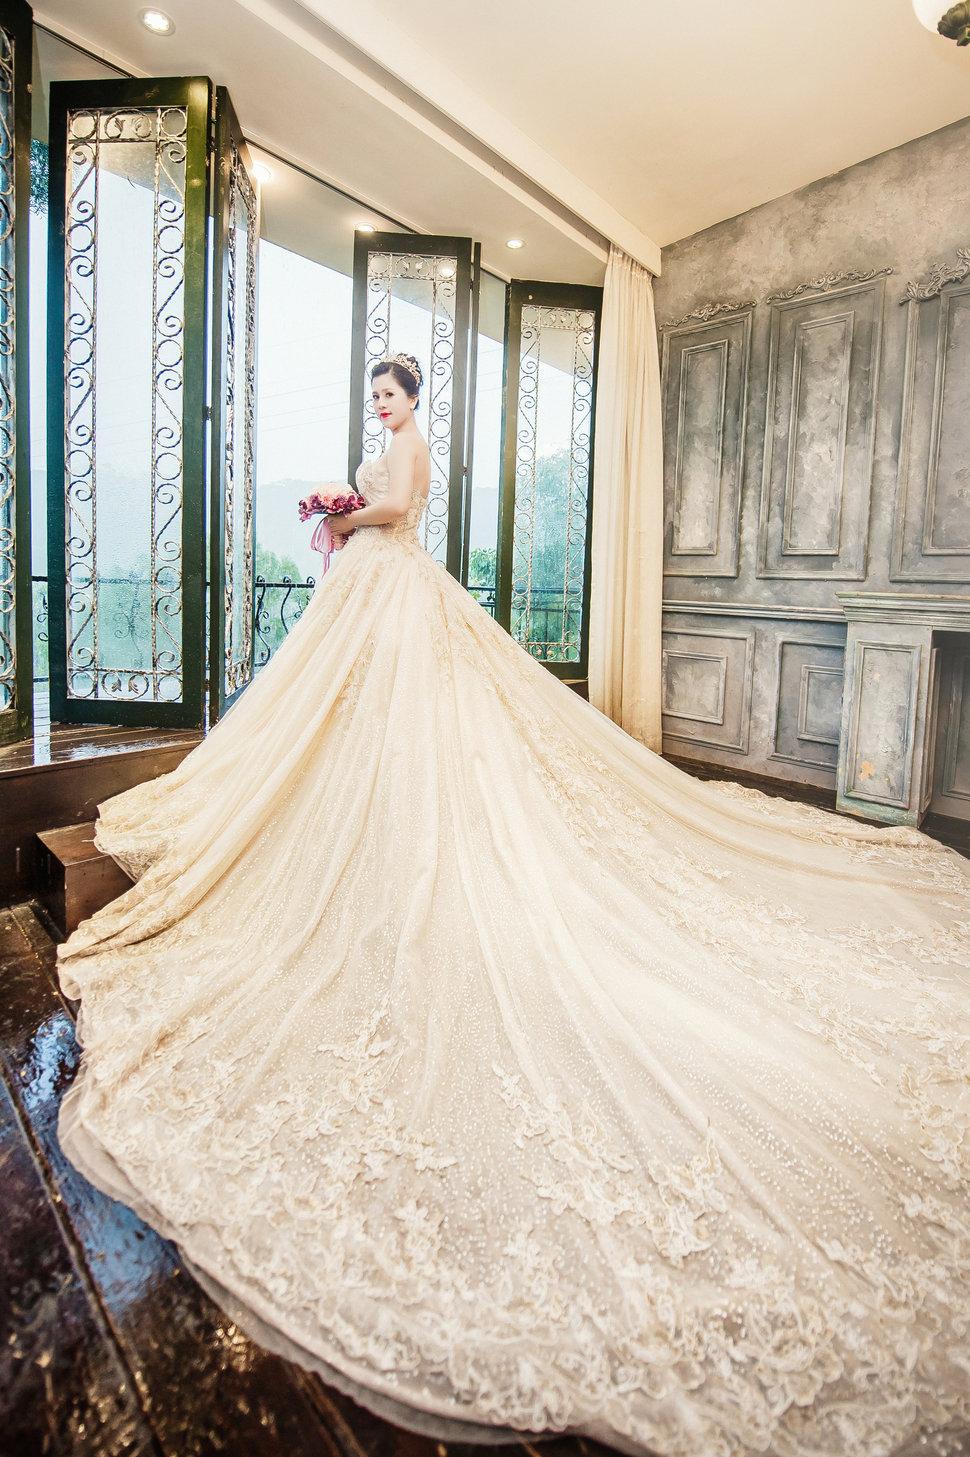 AT-013-6 - IN LACE 品牌婚紗 ‧ 手工訂製《結婚吧》